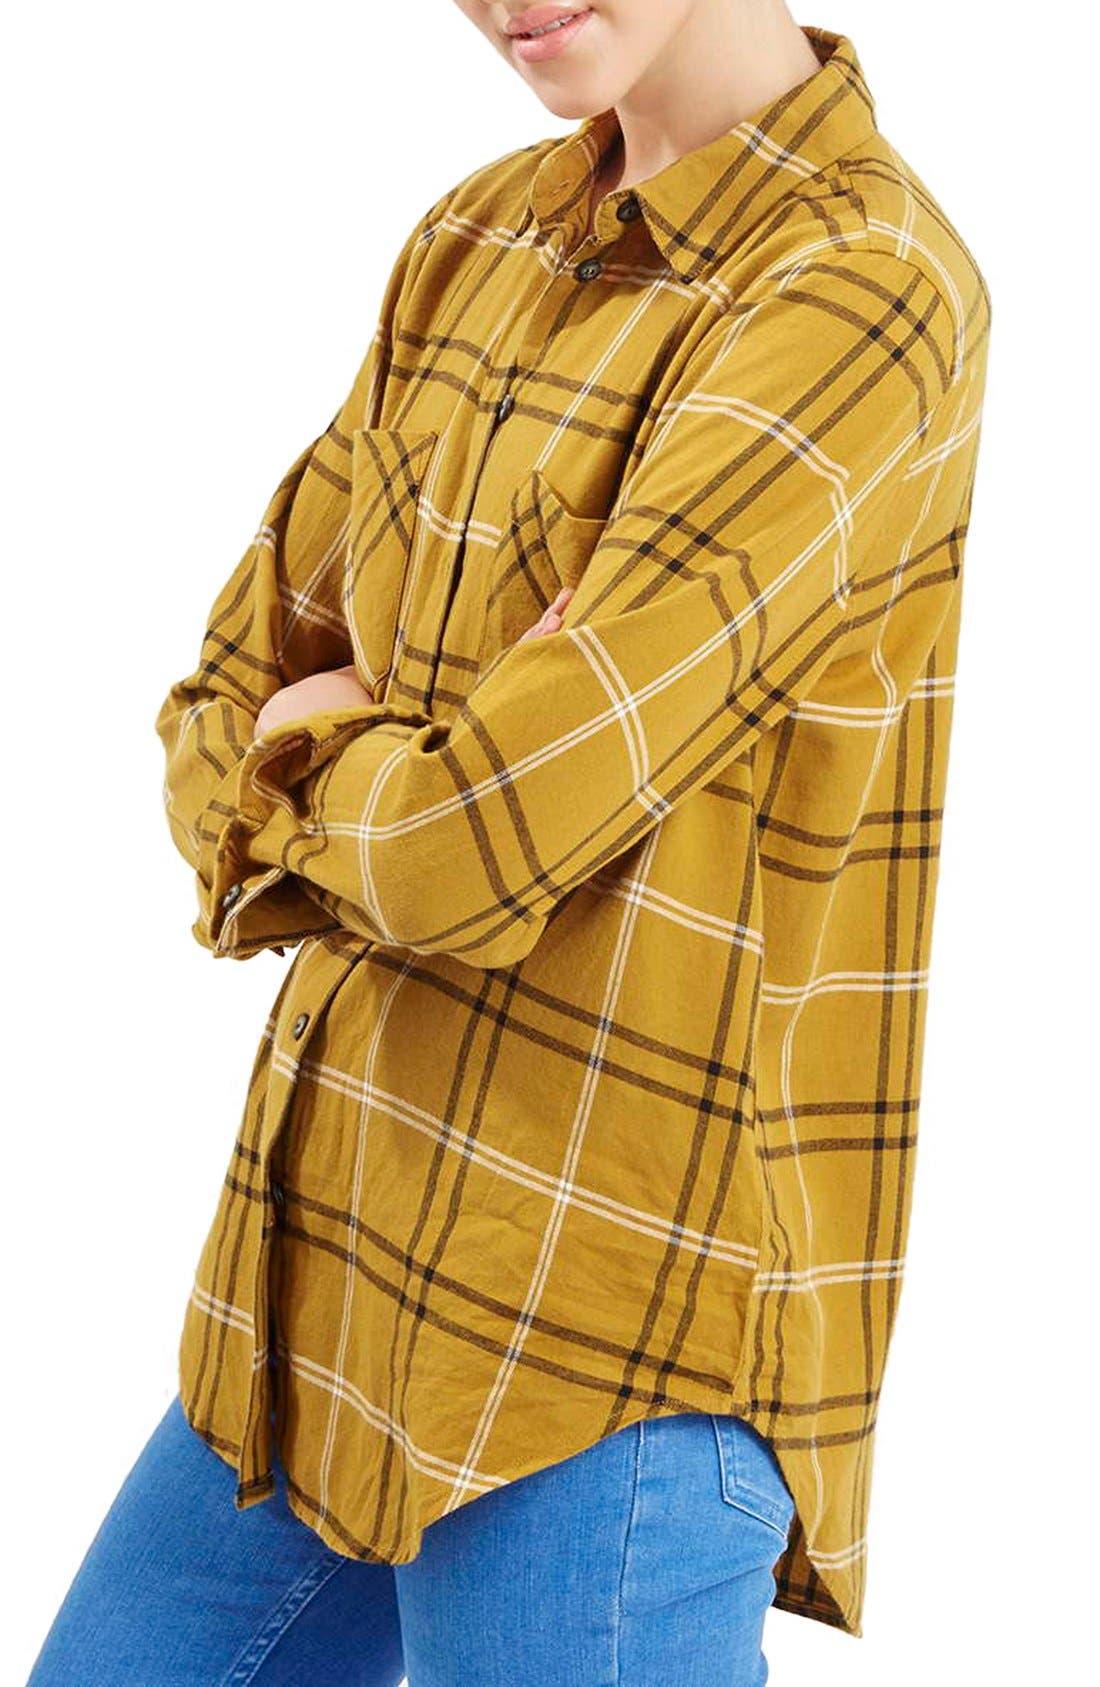 TOPSHOP 'Billie' Check Button FrontBoyfriend Shirt, Main, color, 701